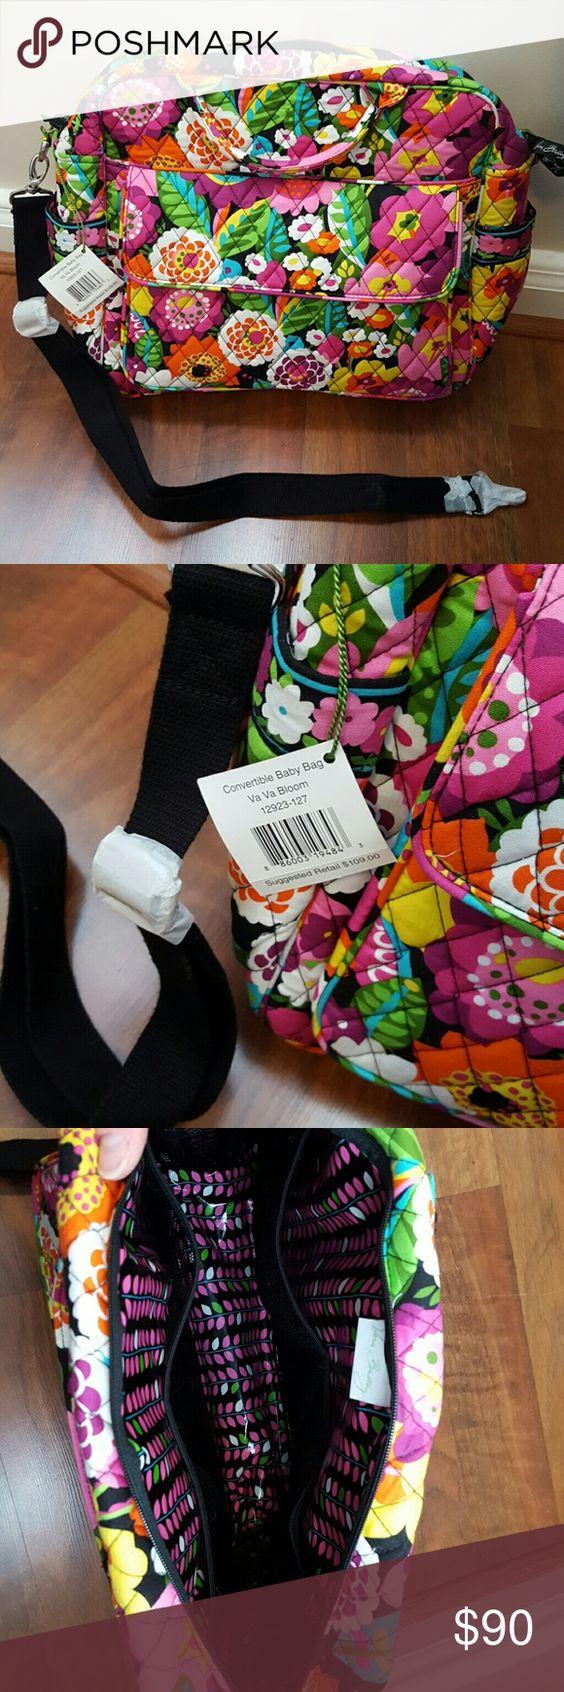 NWT Vera Bradley convertible diaper bag Shoulder strap   short handles 3d41e55ce52e4